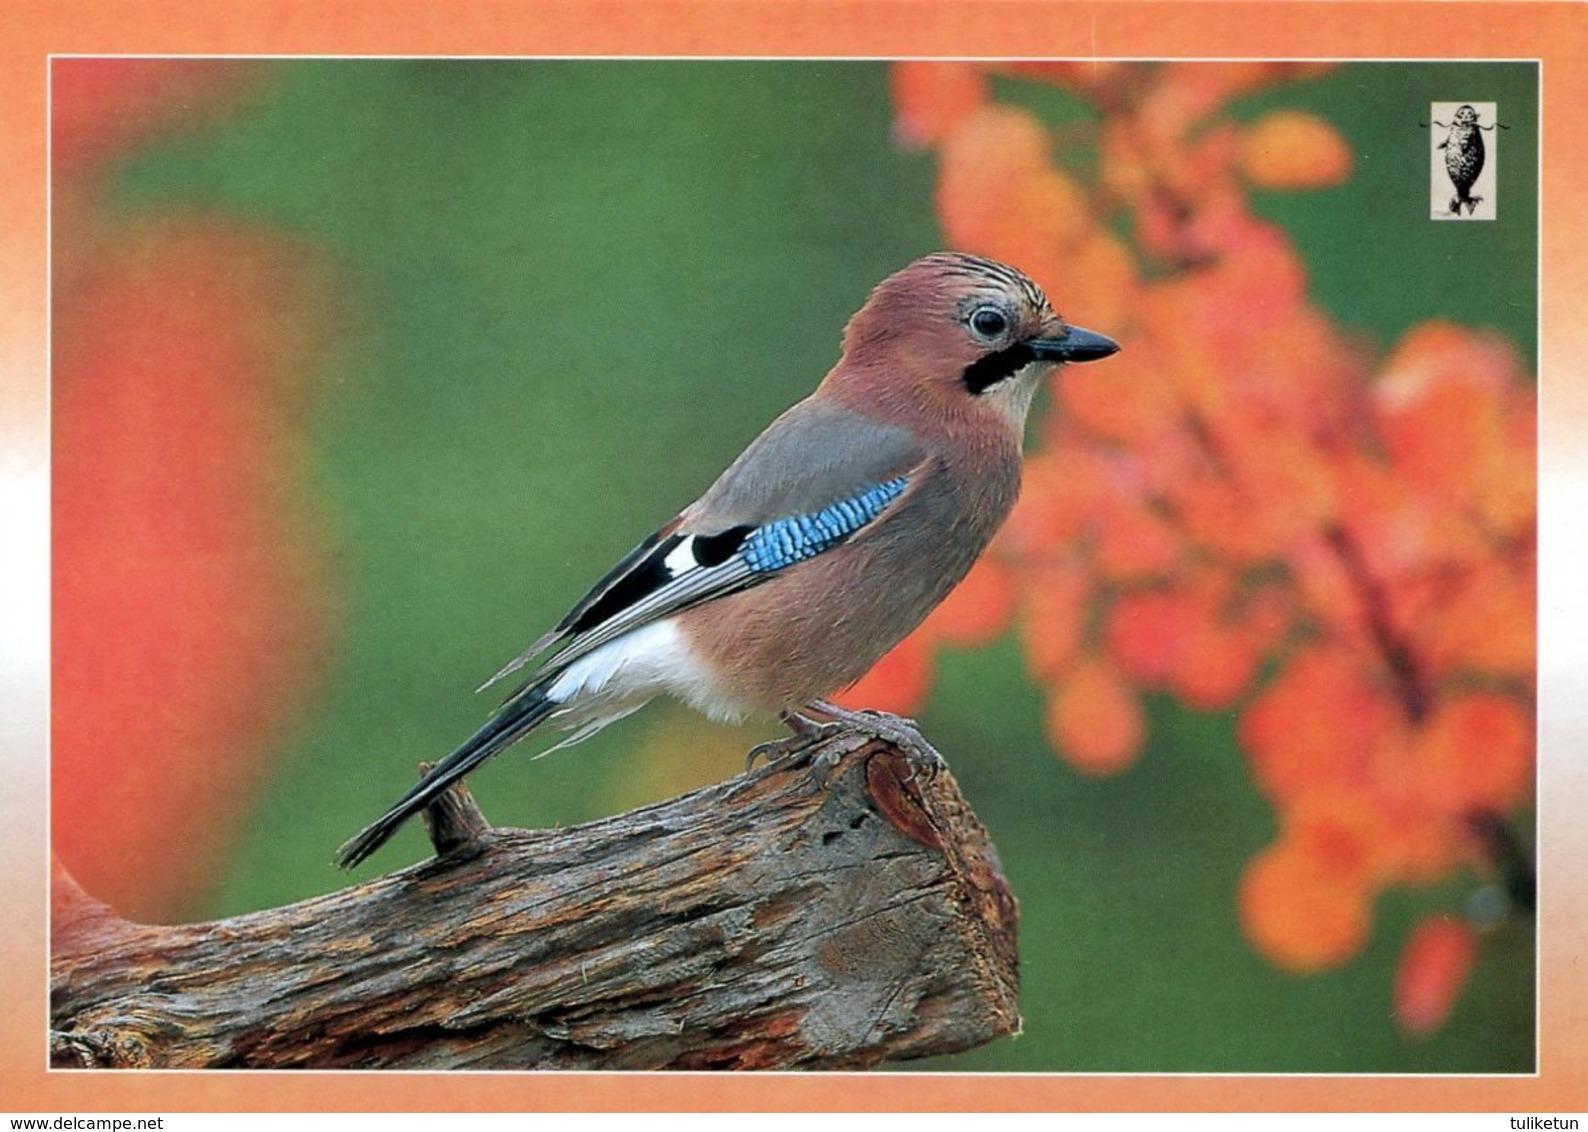 Bird - Oiseau - Vogel - Uccello - Pássaro - Pájaro - Animal - Fauna - Jay - Närhi - (Ringed Seal Logo) - Uccelli